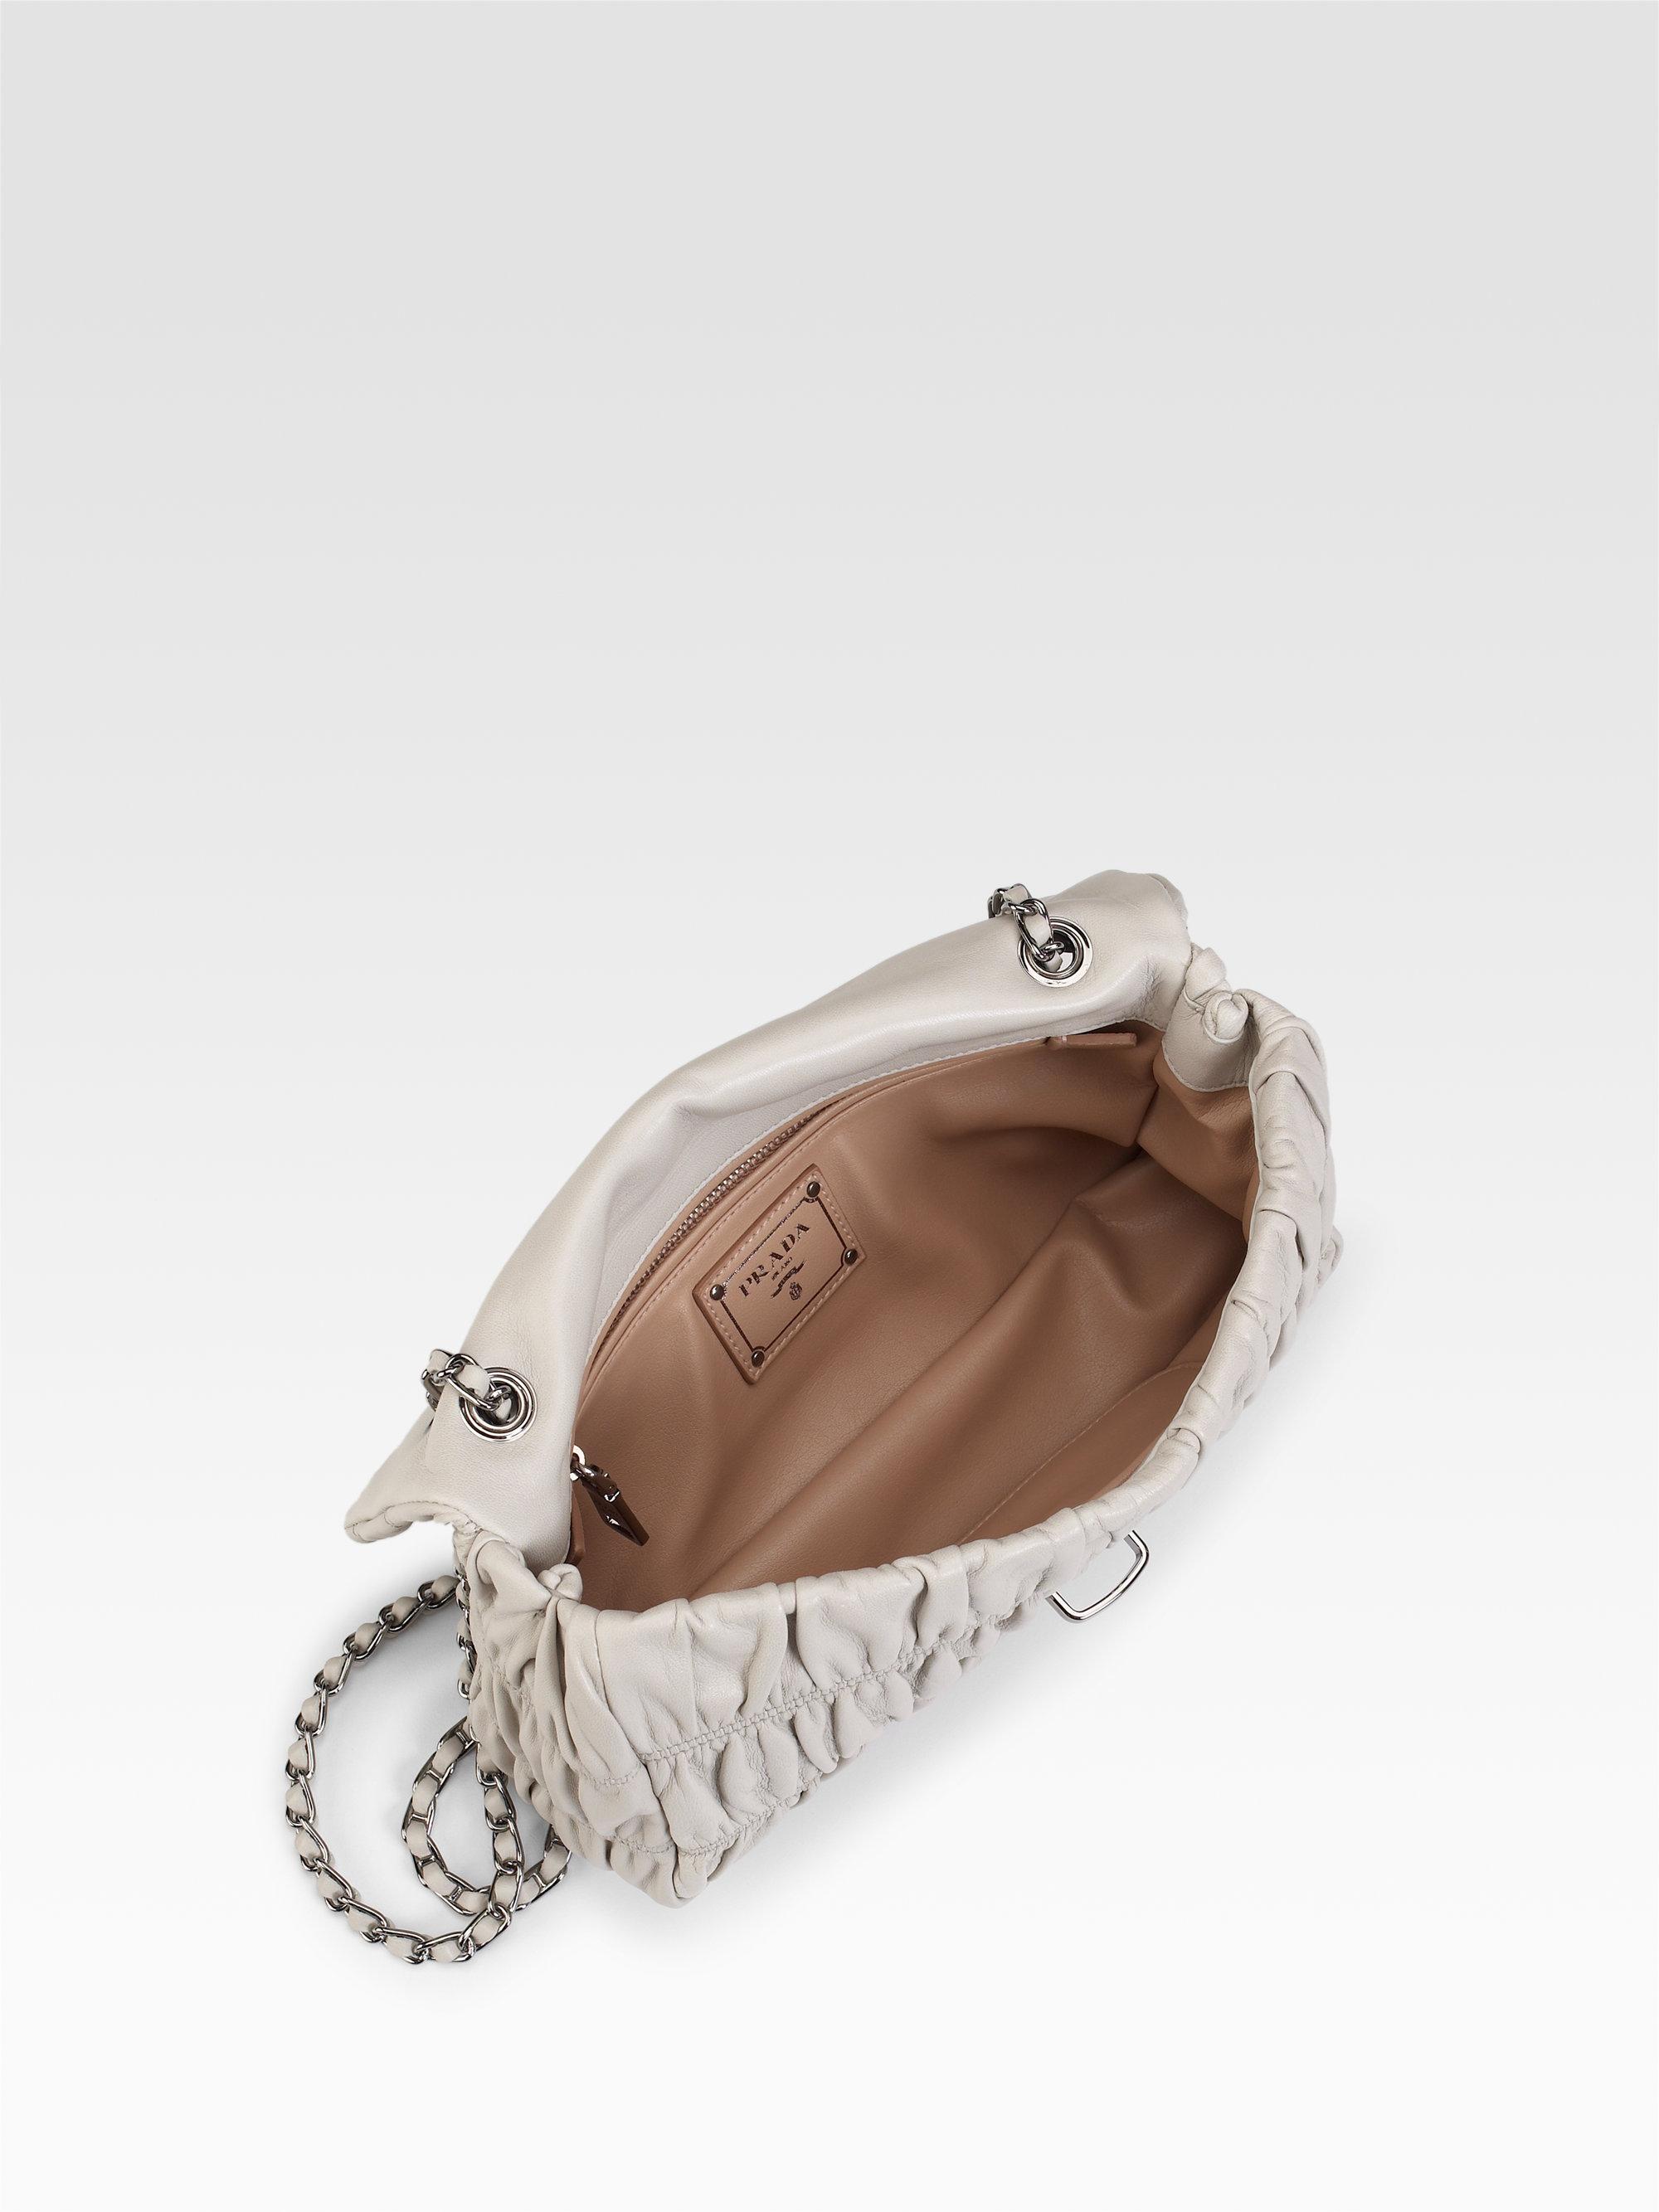 Prada Small Nappa Gaufre Mini Shoulder Bag in Black | Lyst